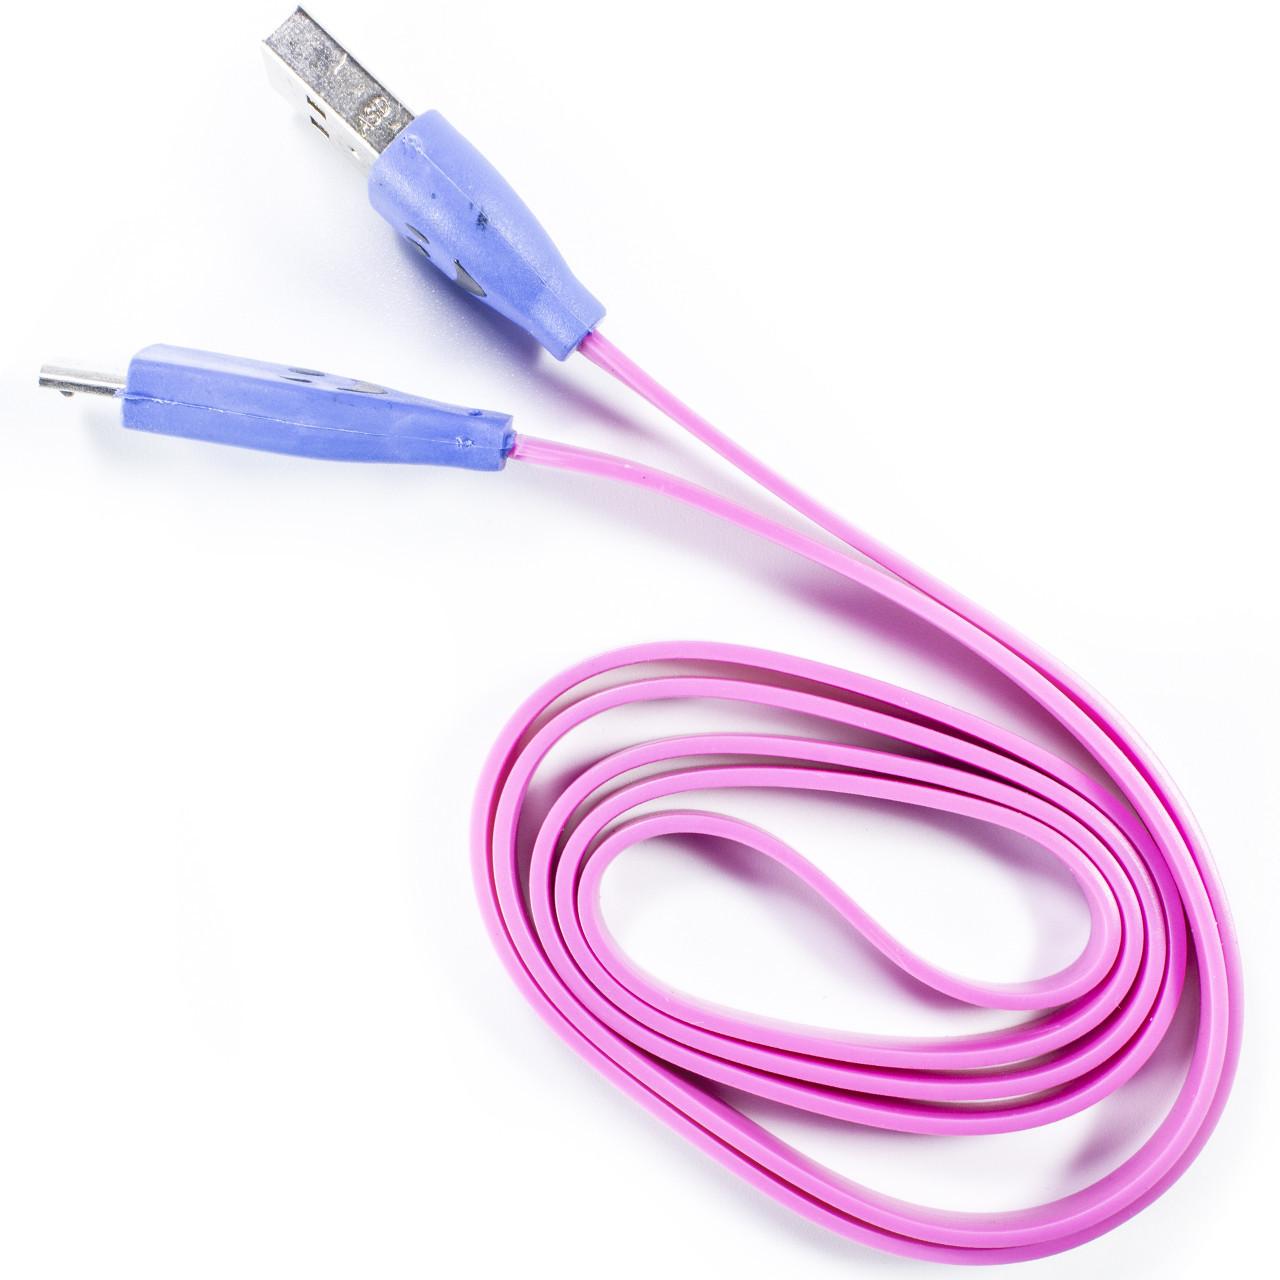 Кабель Lesko с подсветкой microUSB/USB 1m Розовый (114-3833)